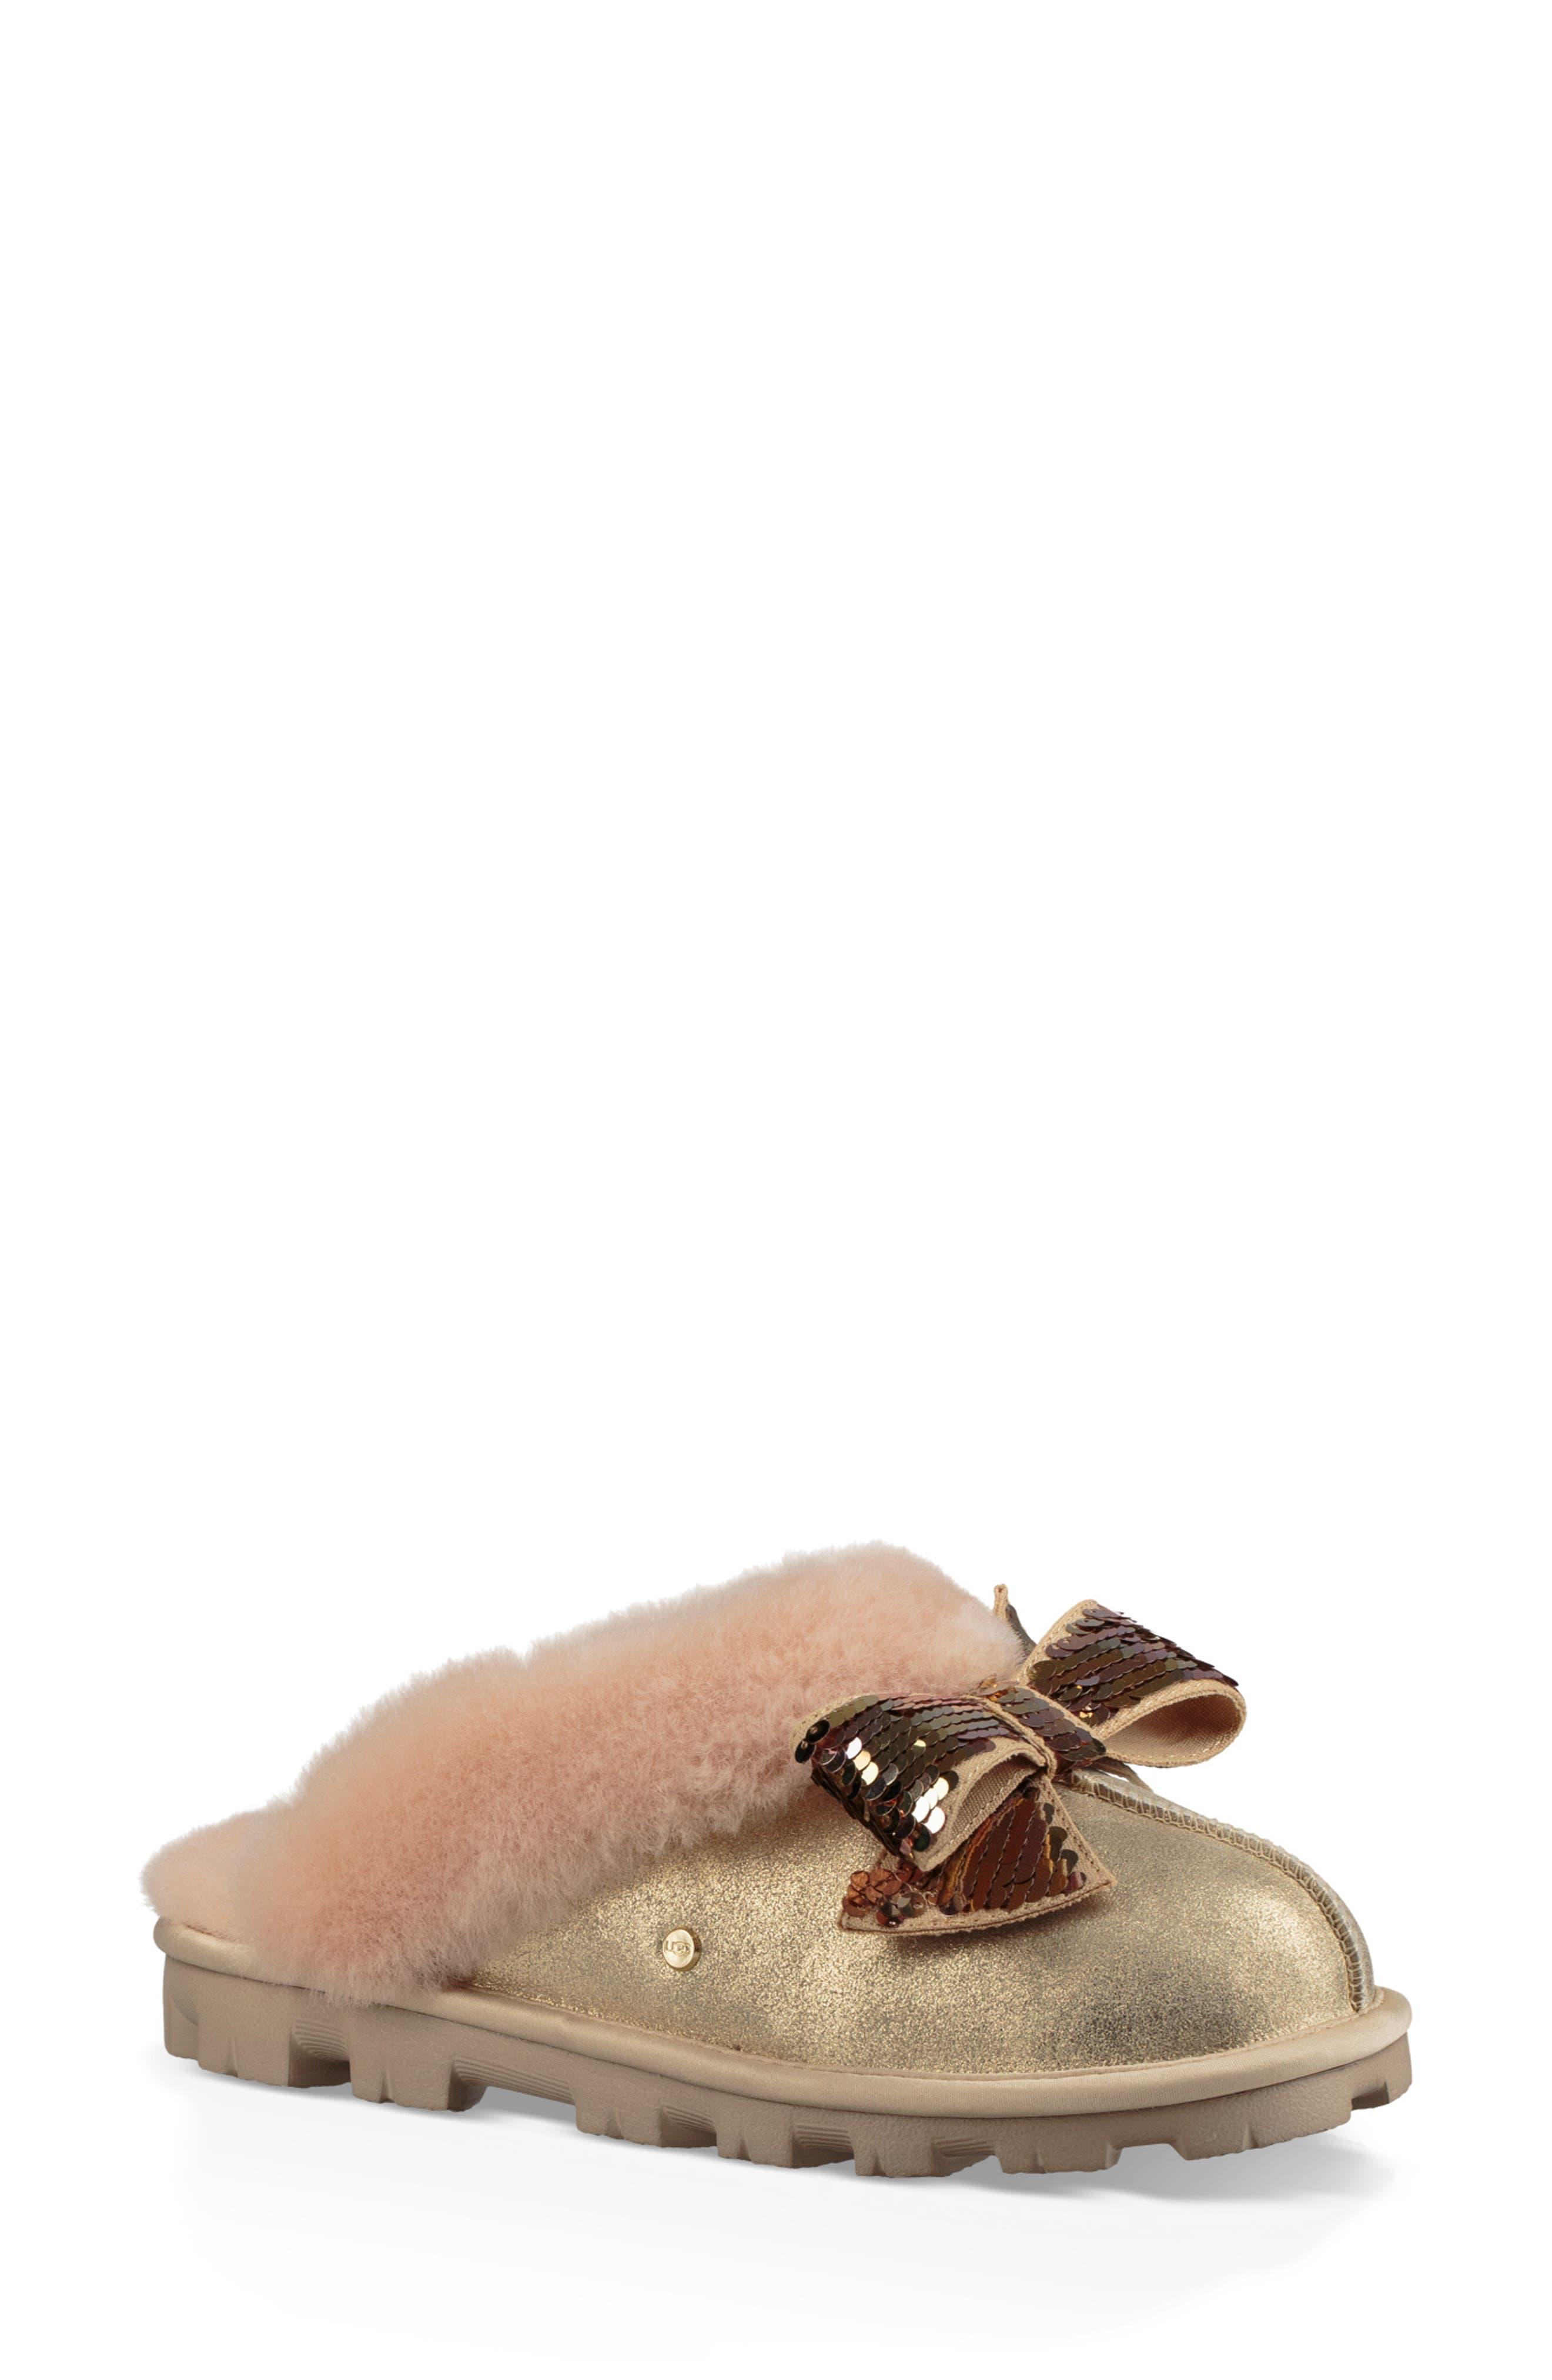 Ugg Genuine Shearling & Sequin Bow Slipper